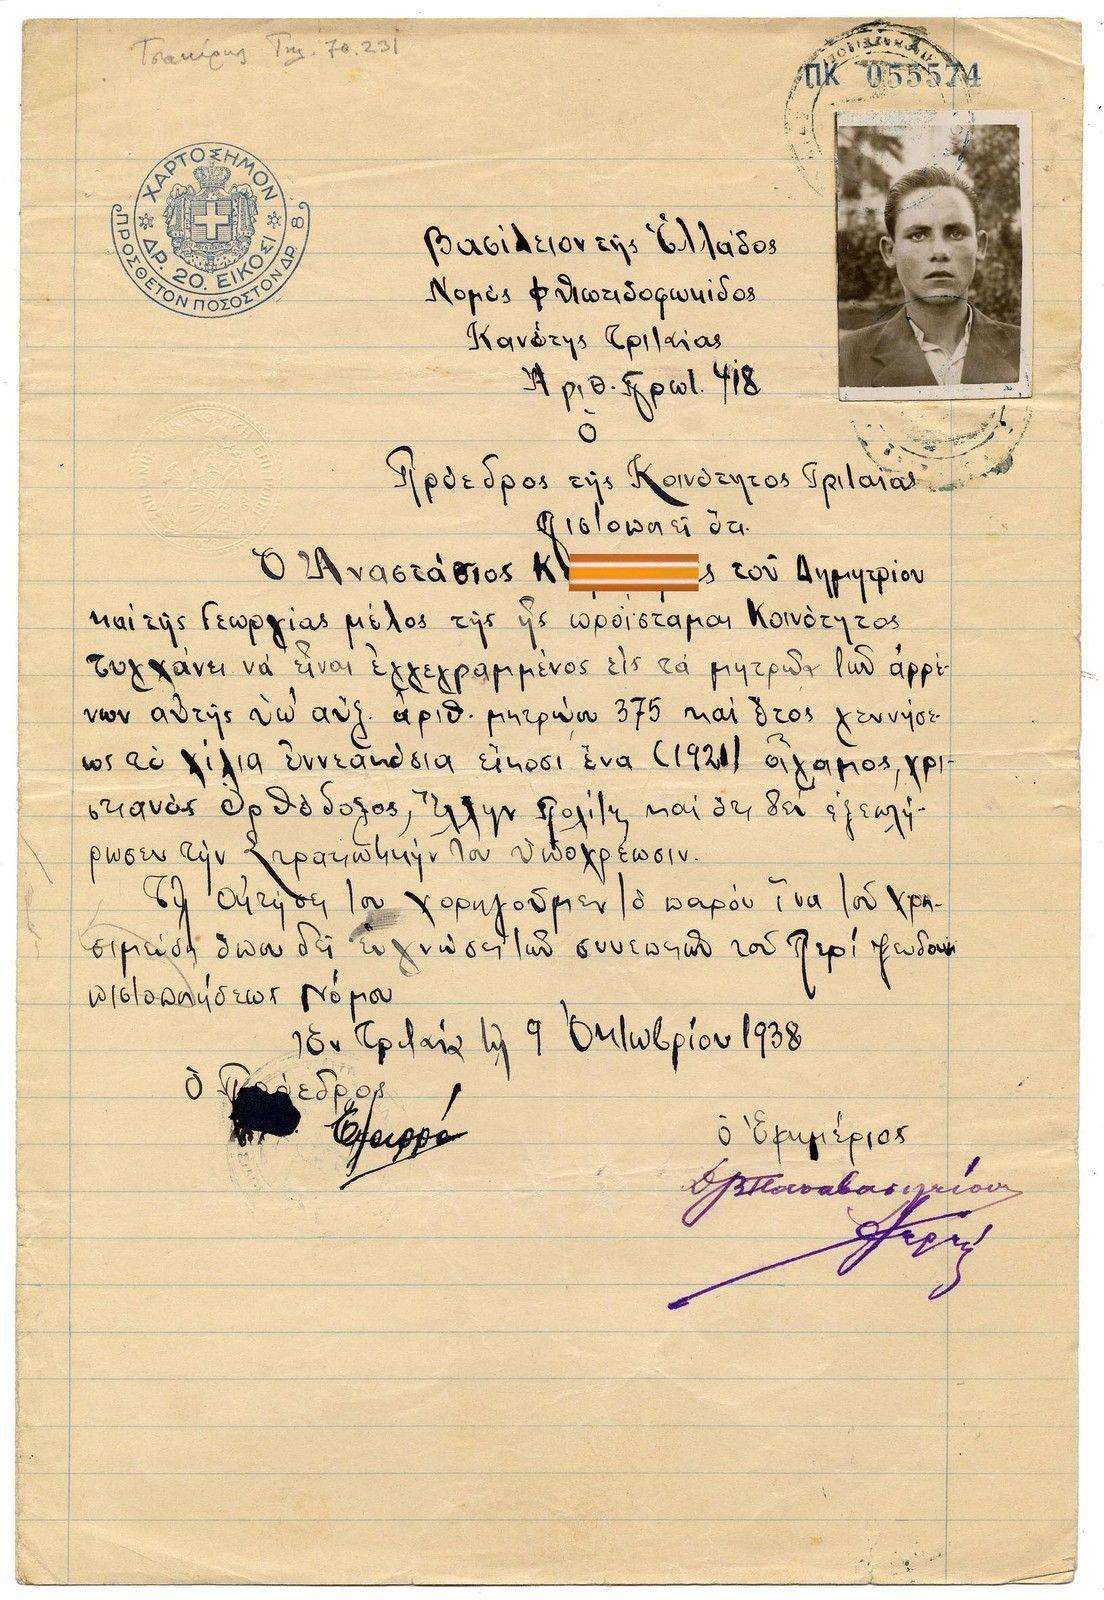 Greece tritea 1938 document birth certificate ebay greece greece tritea 1938 document birth certificate ebay 1betcityfo Gallery